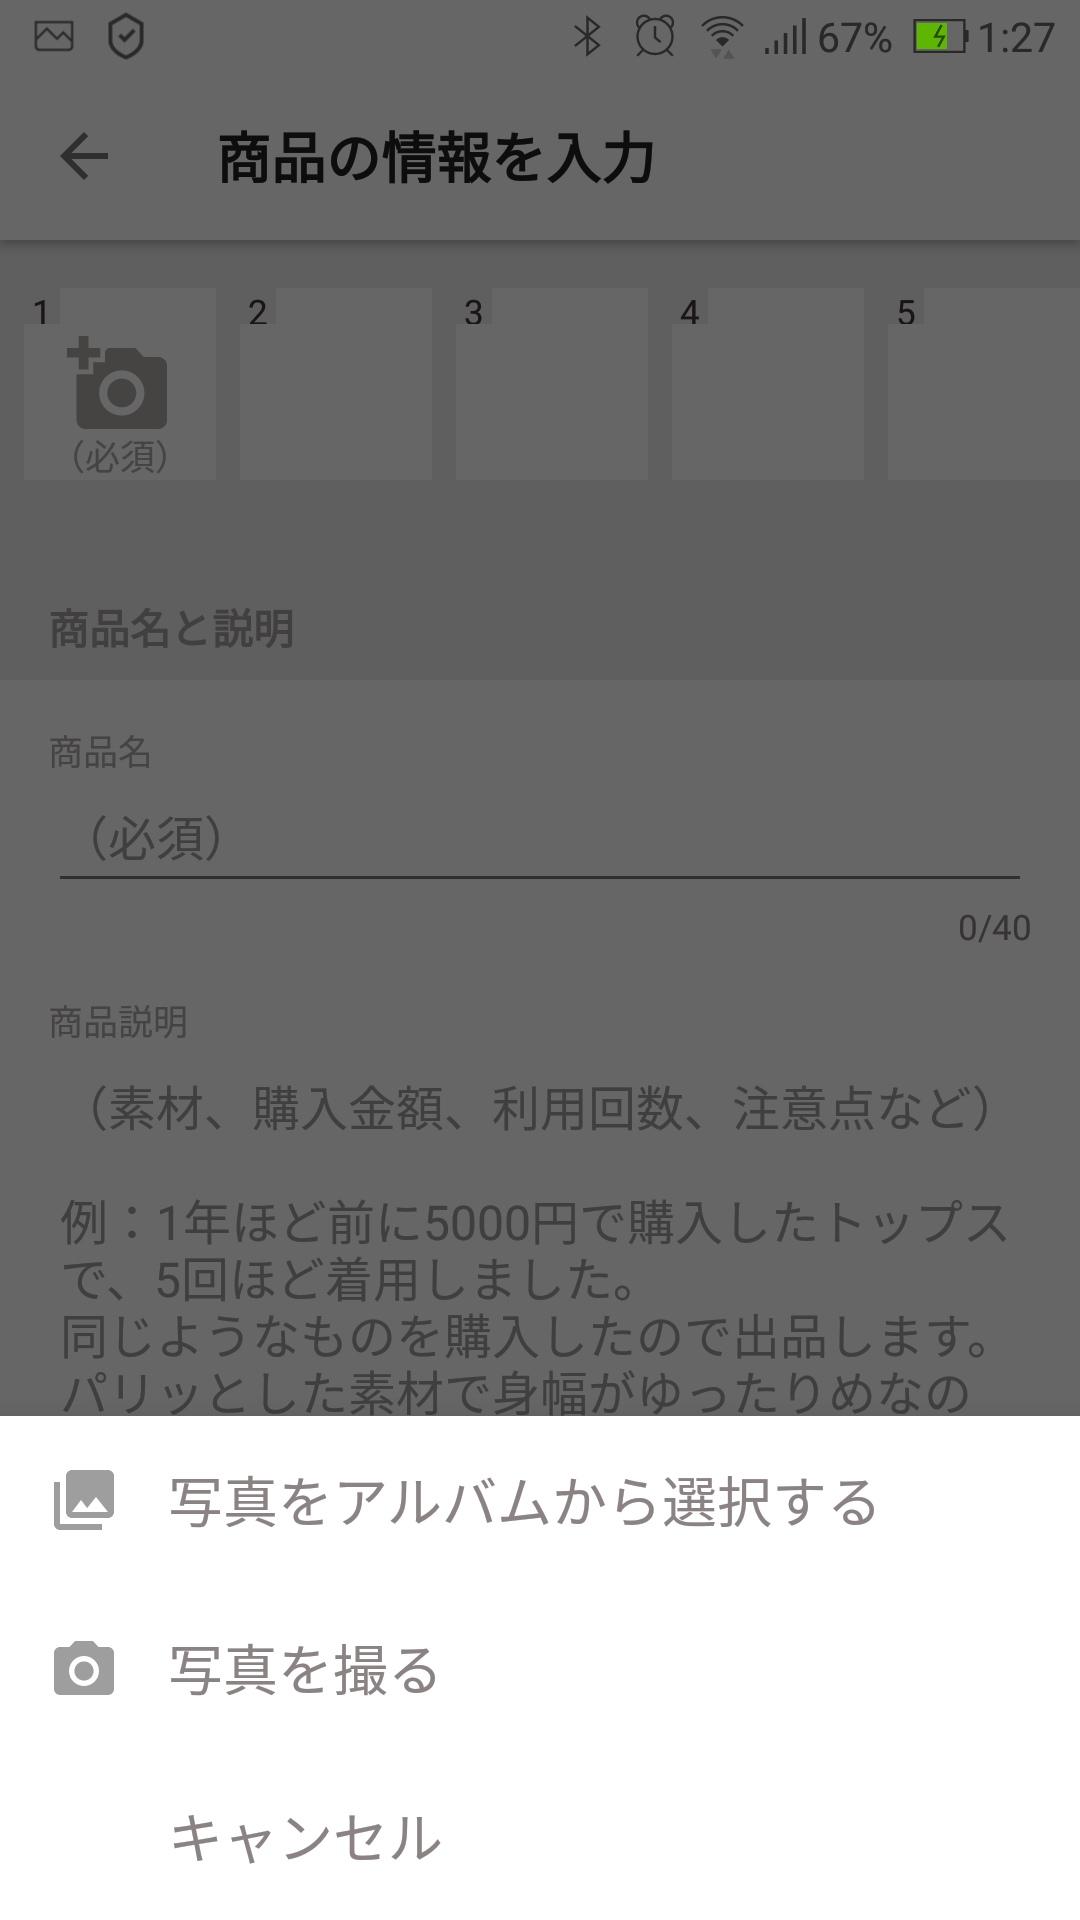 Screenshot 20191102 012802 - メルカリからPayapyフリマへ出品切り替えと比較~最短手順・画像付き